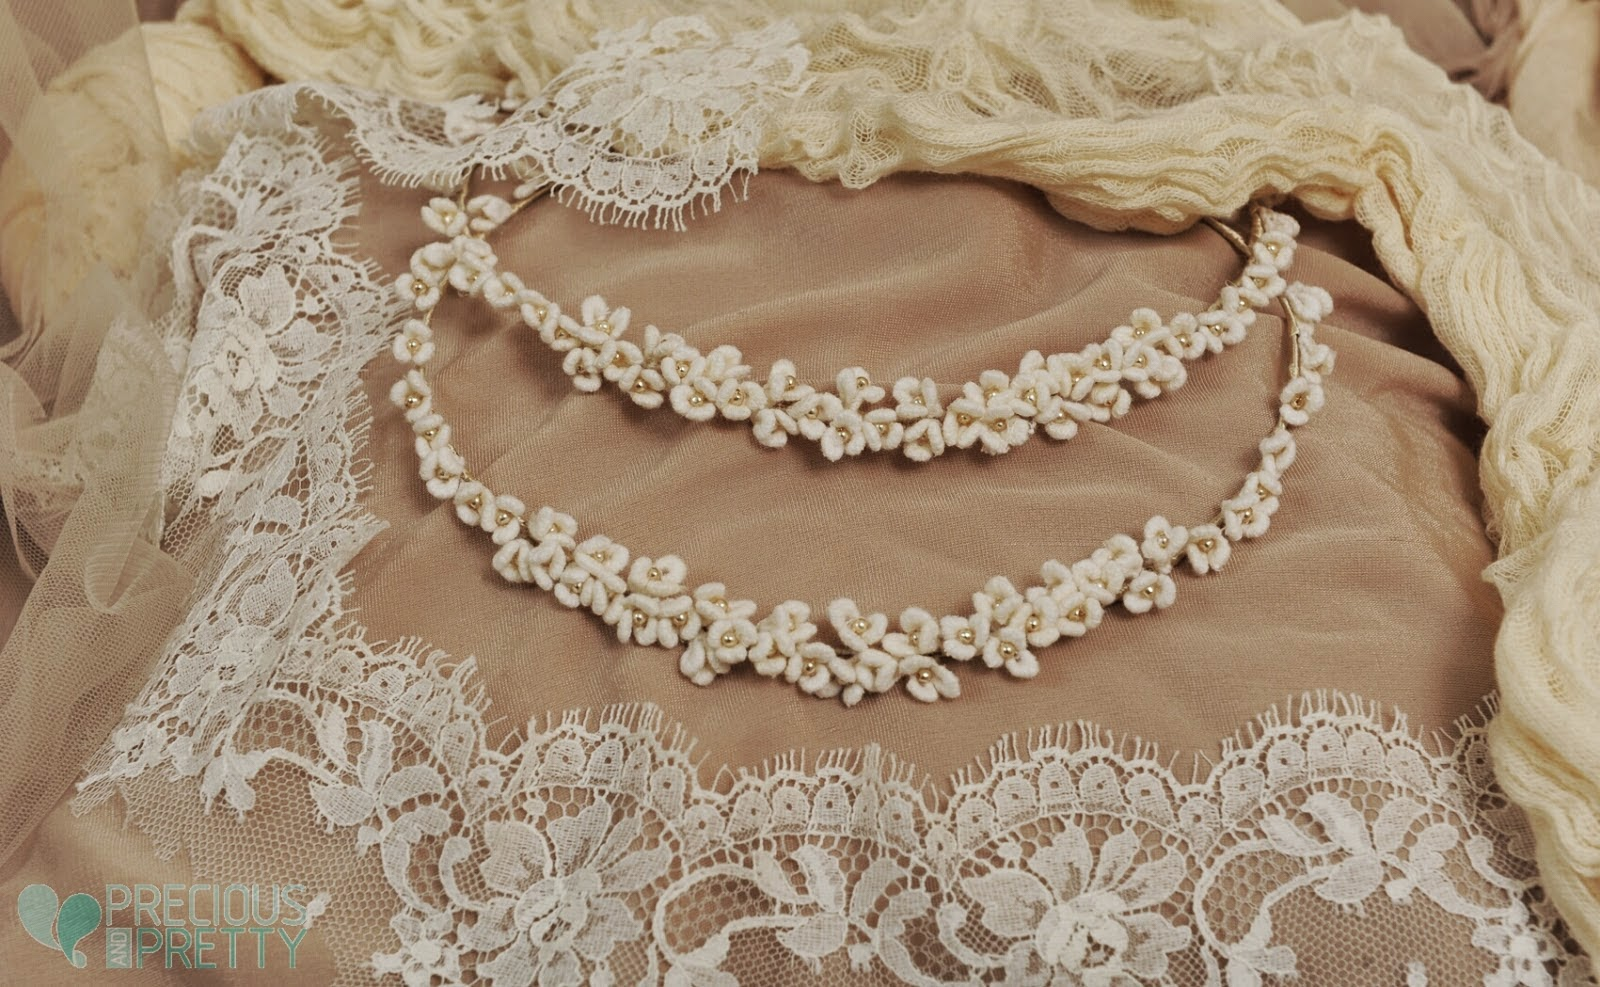 Wedding stefana crowns fabric flowers